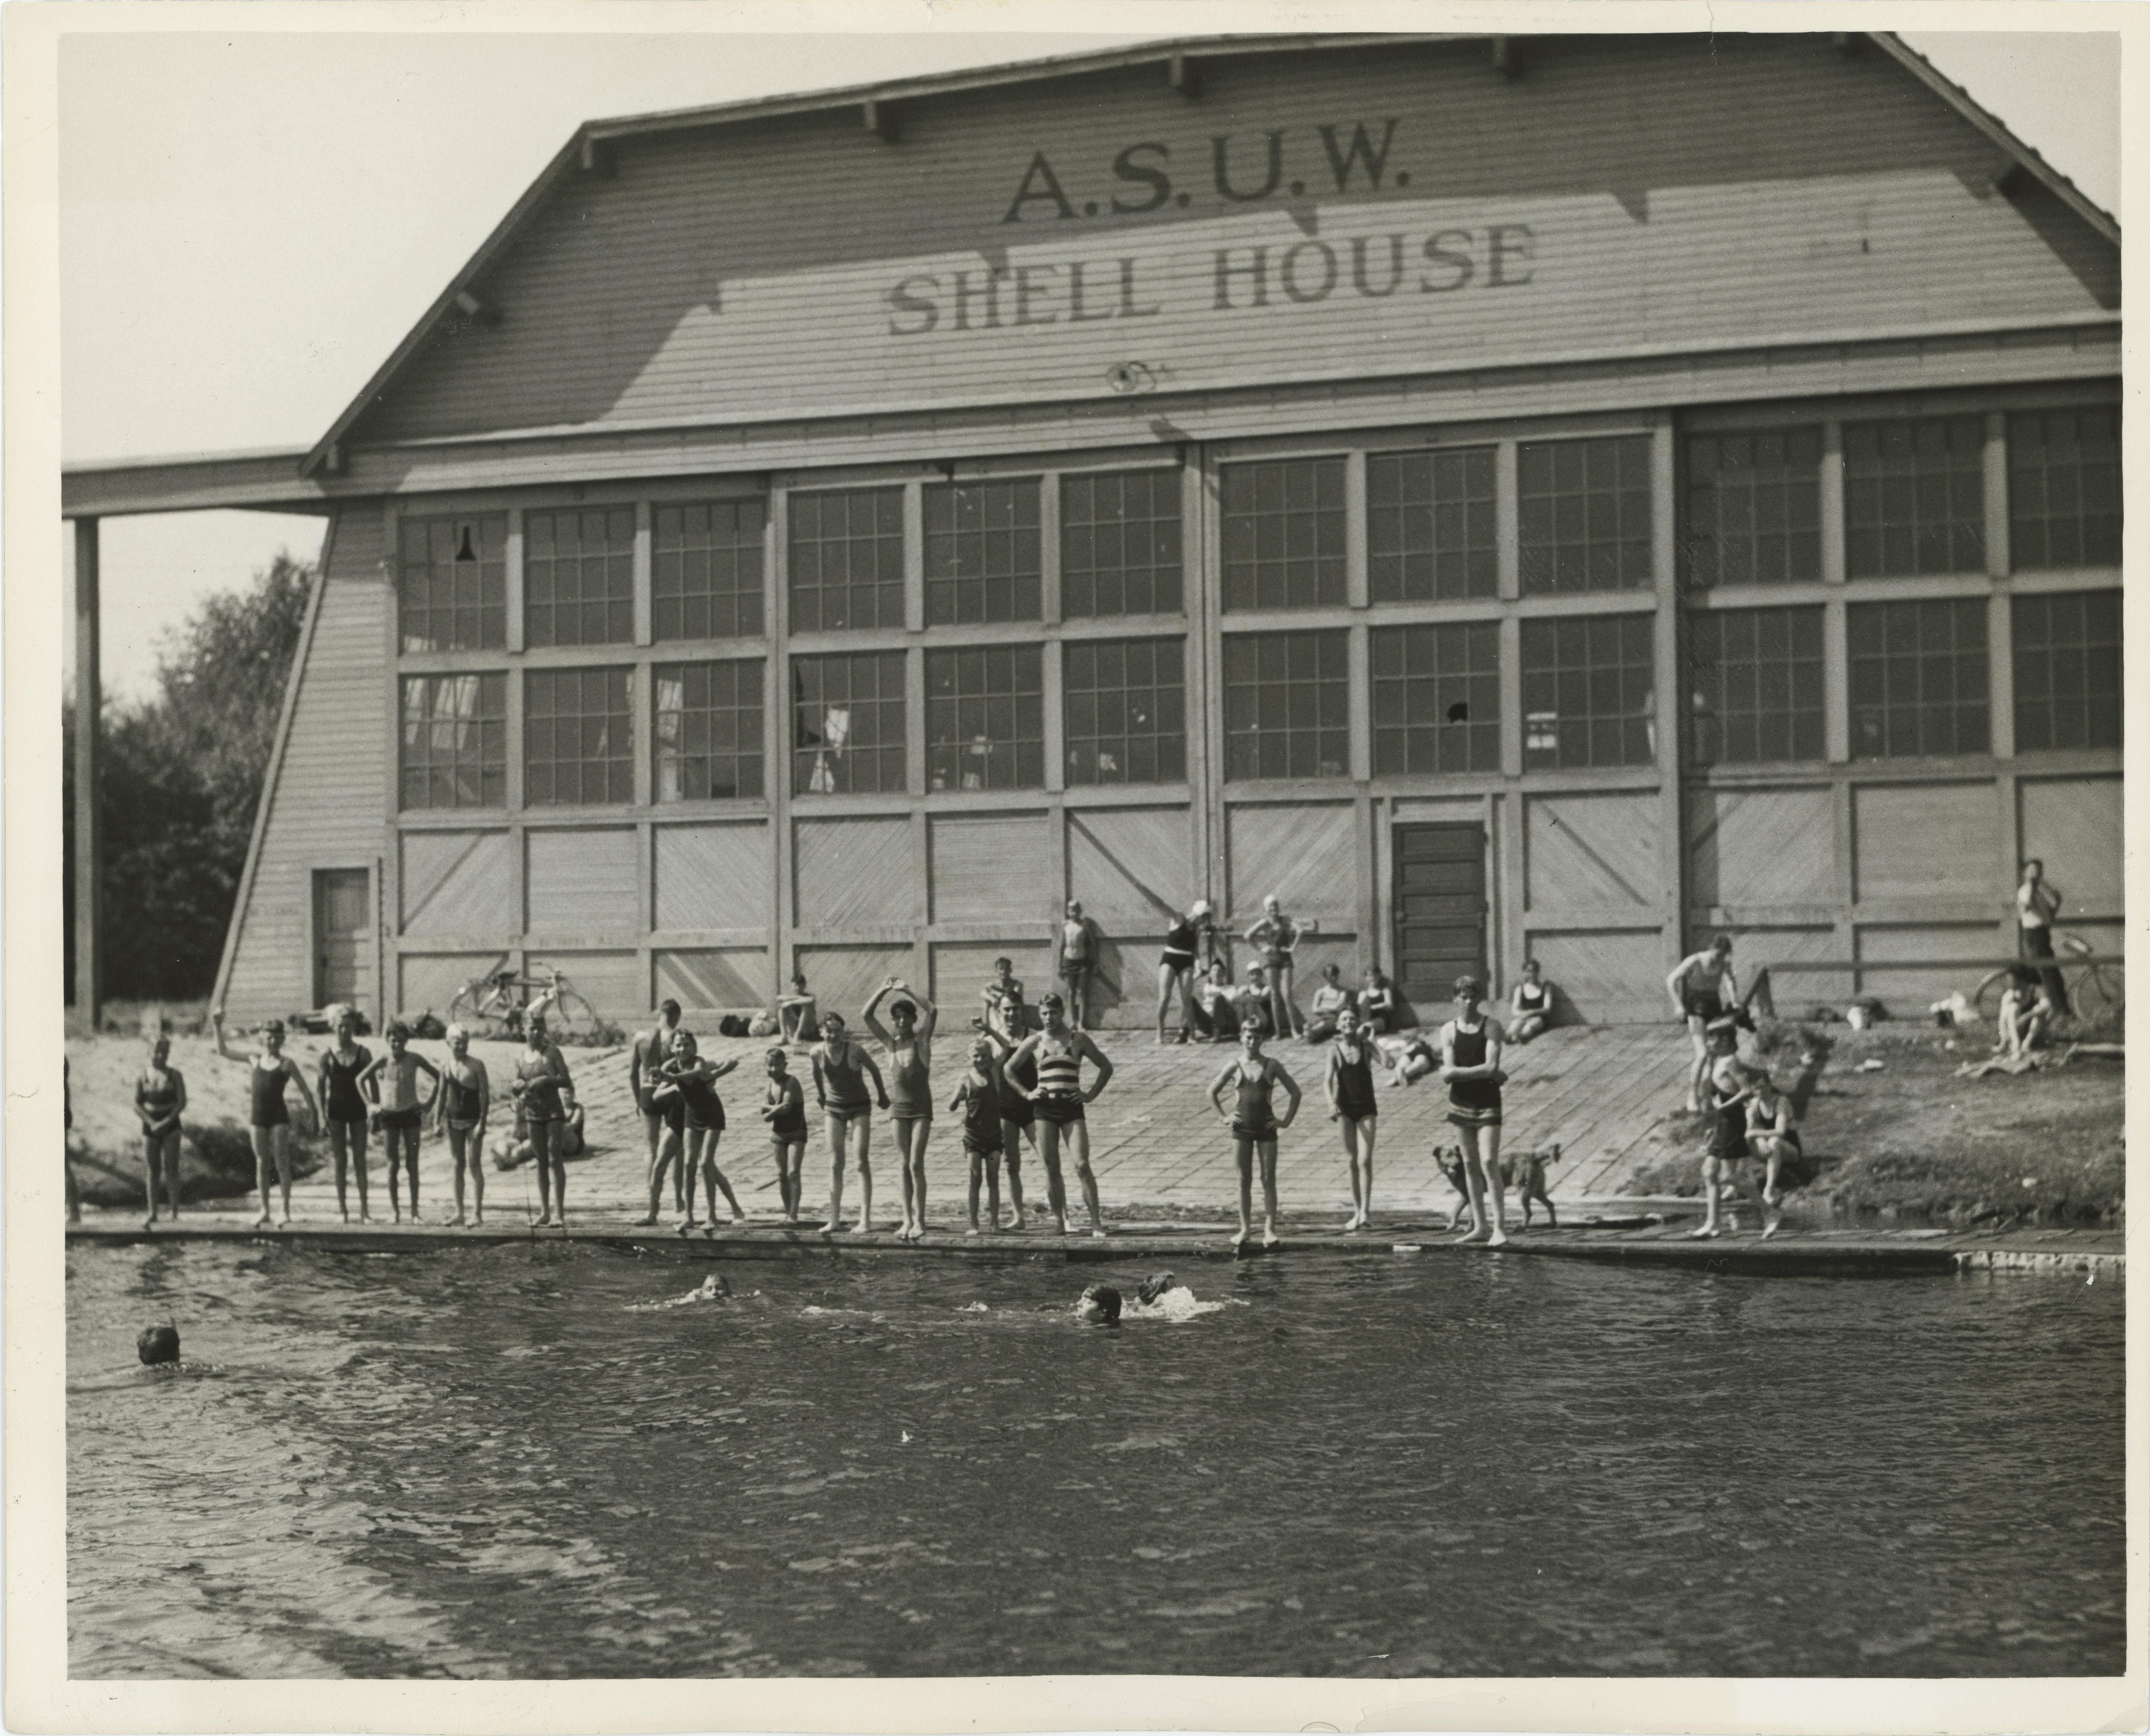 ASUW Shell House 1930 5k